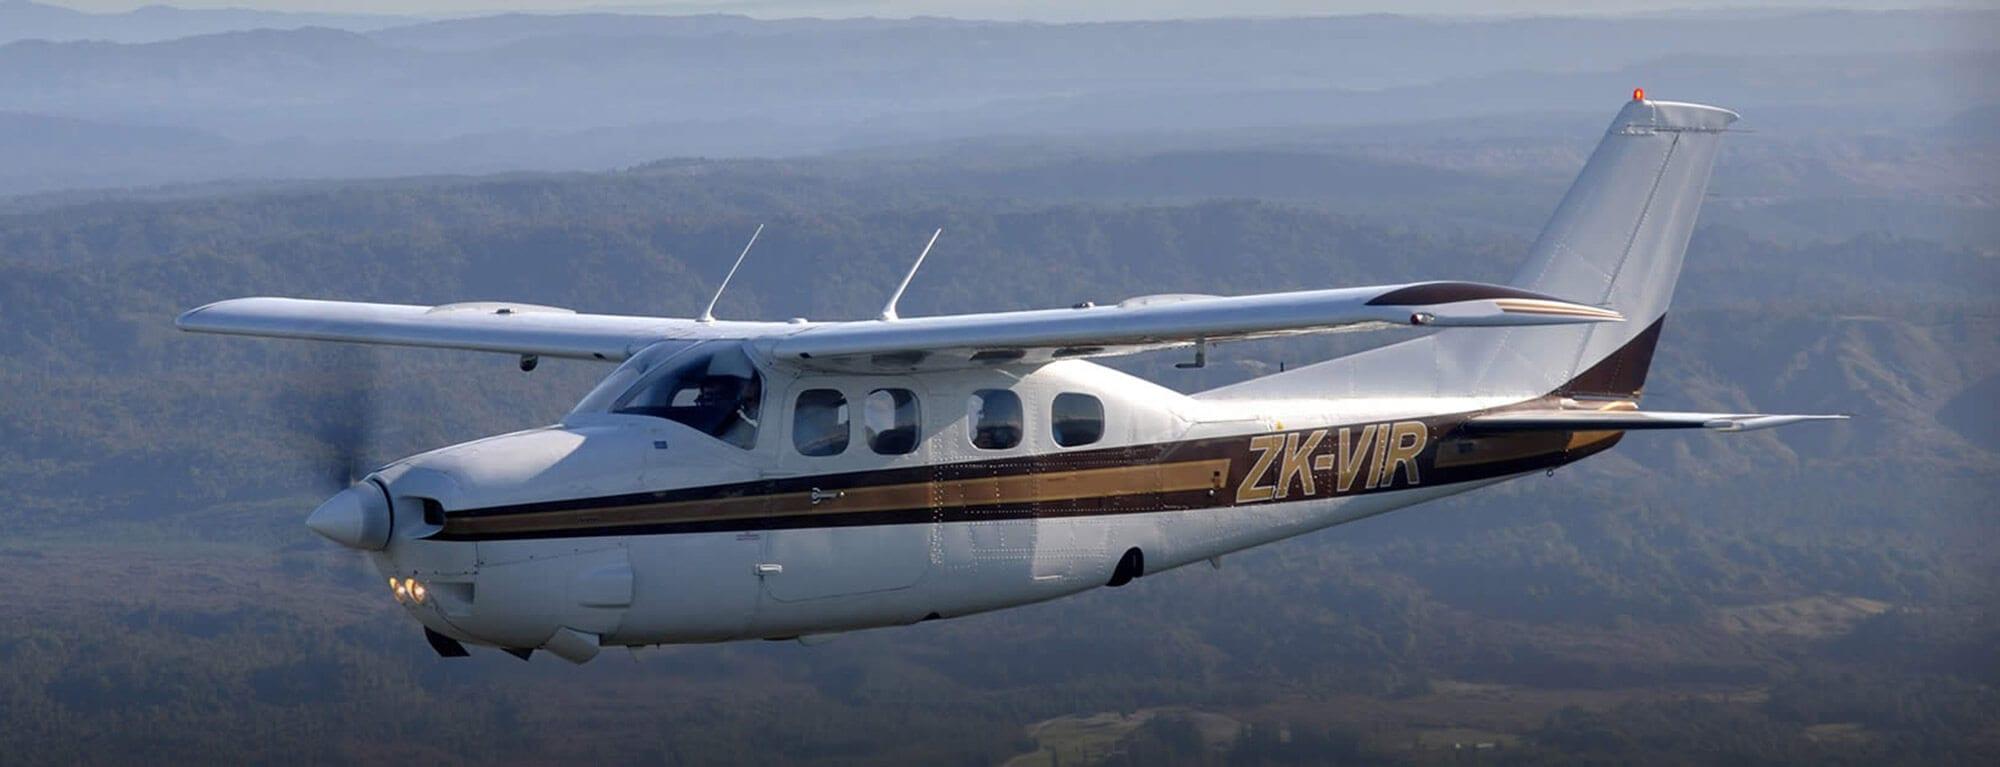 flugschule-austrian-pilots-academy-salzburg-mobile-6